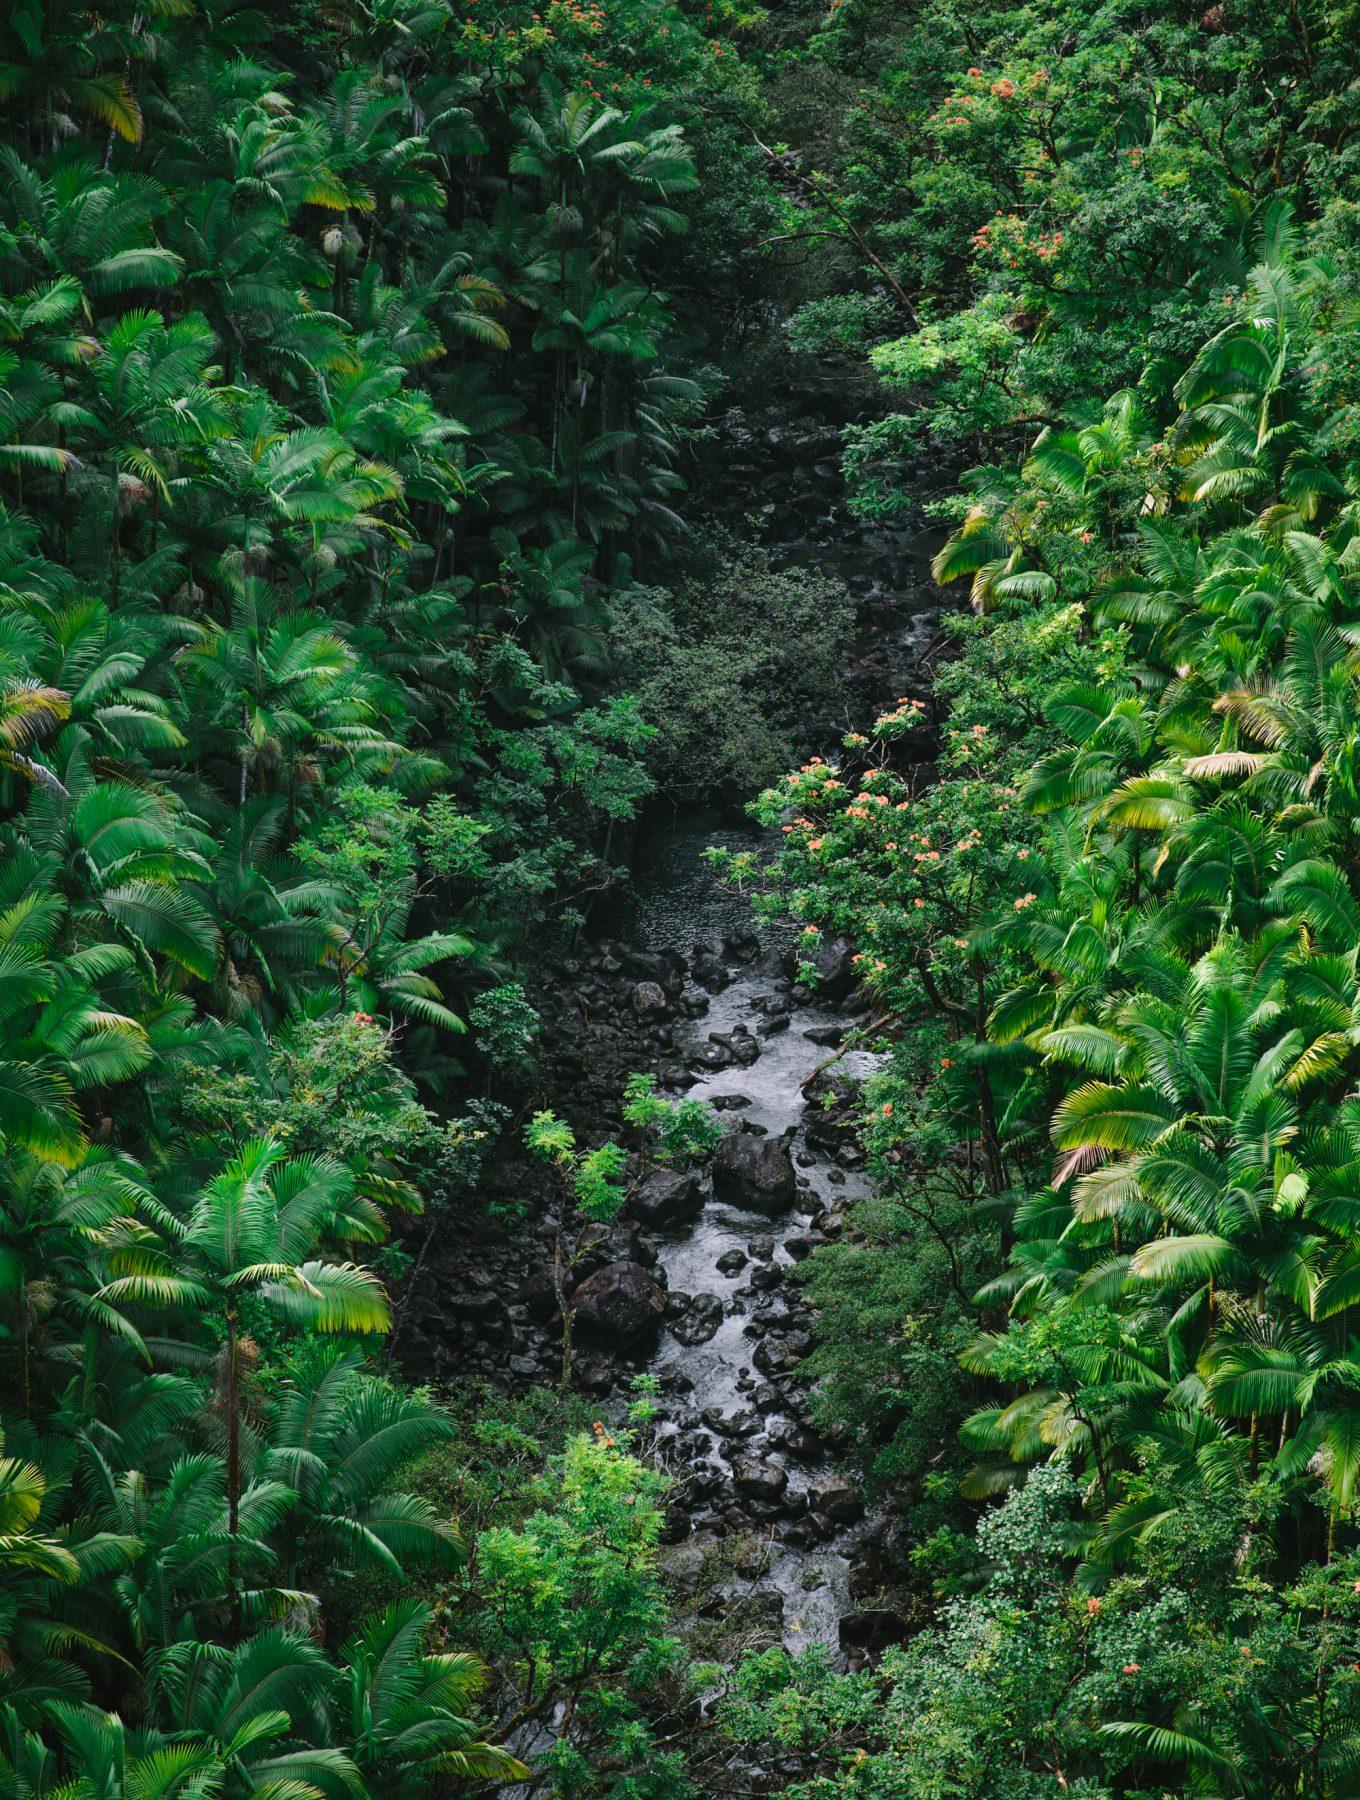 Hawaii-Big-Island-Travel-Guide-by-Eva-Kosmas-Flores-42-1360x1800.jpg